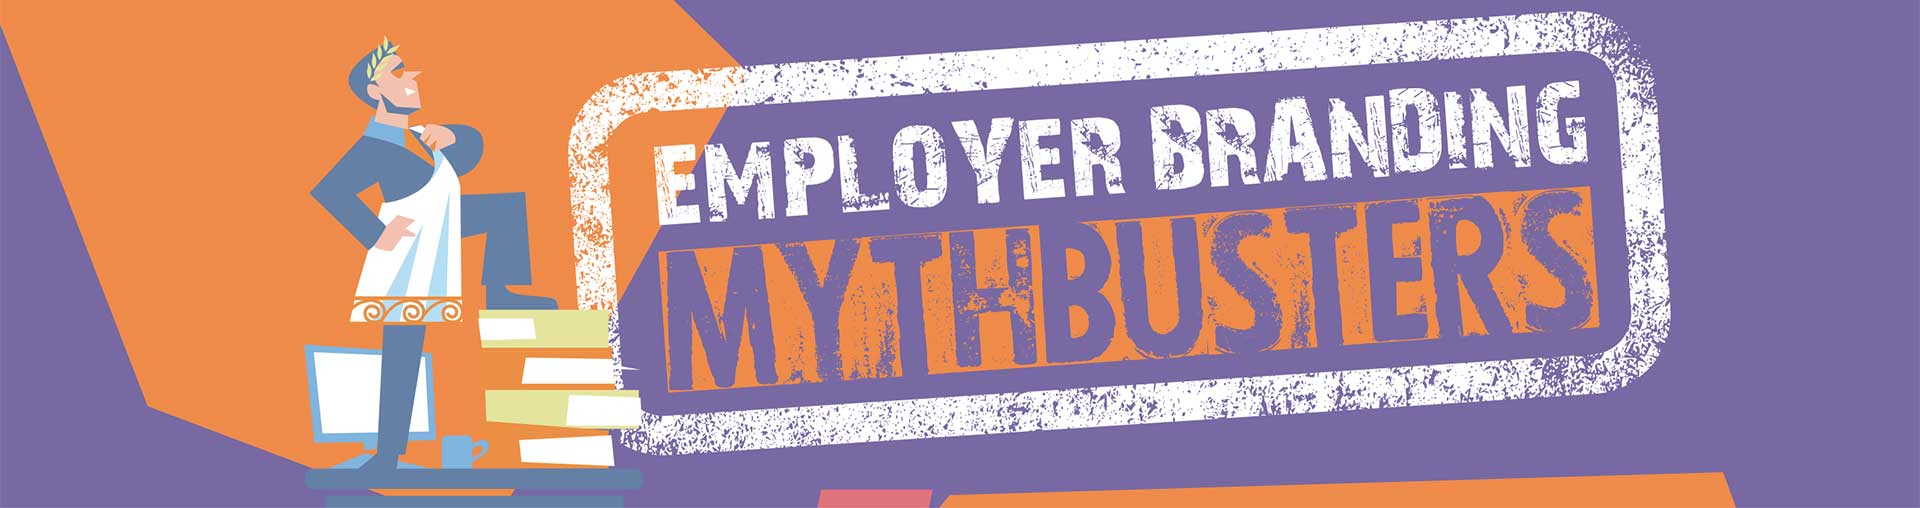 Employer Branding Mythbusters